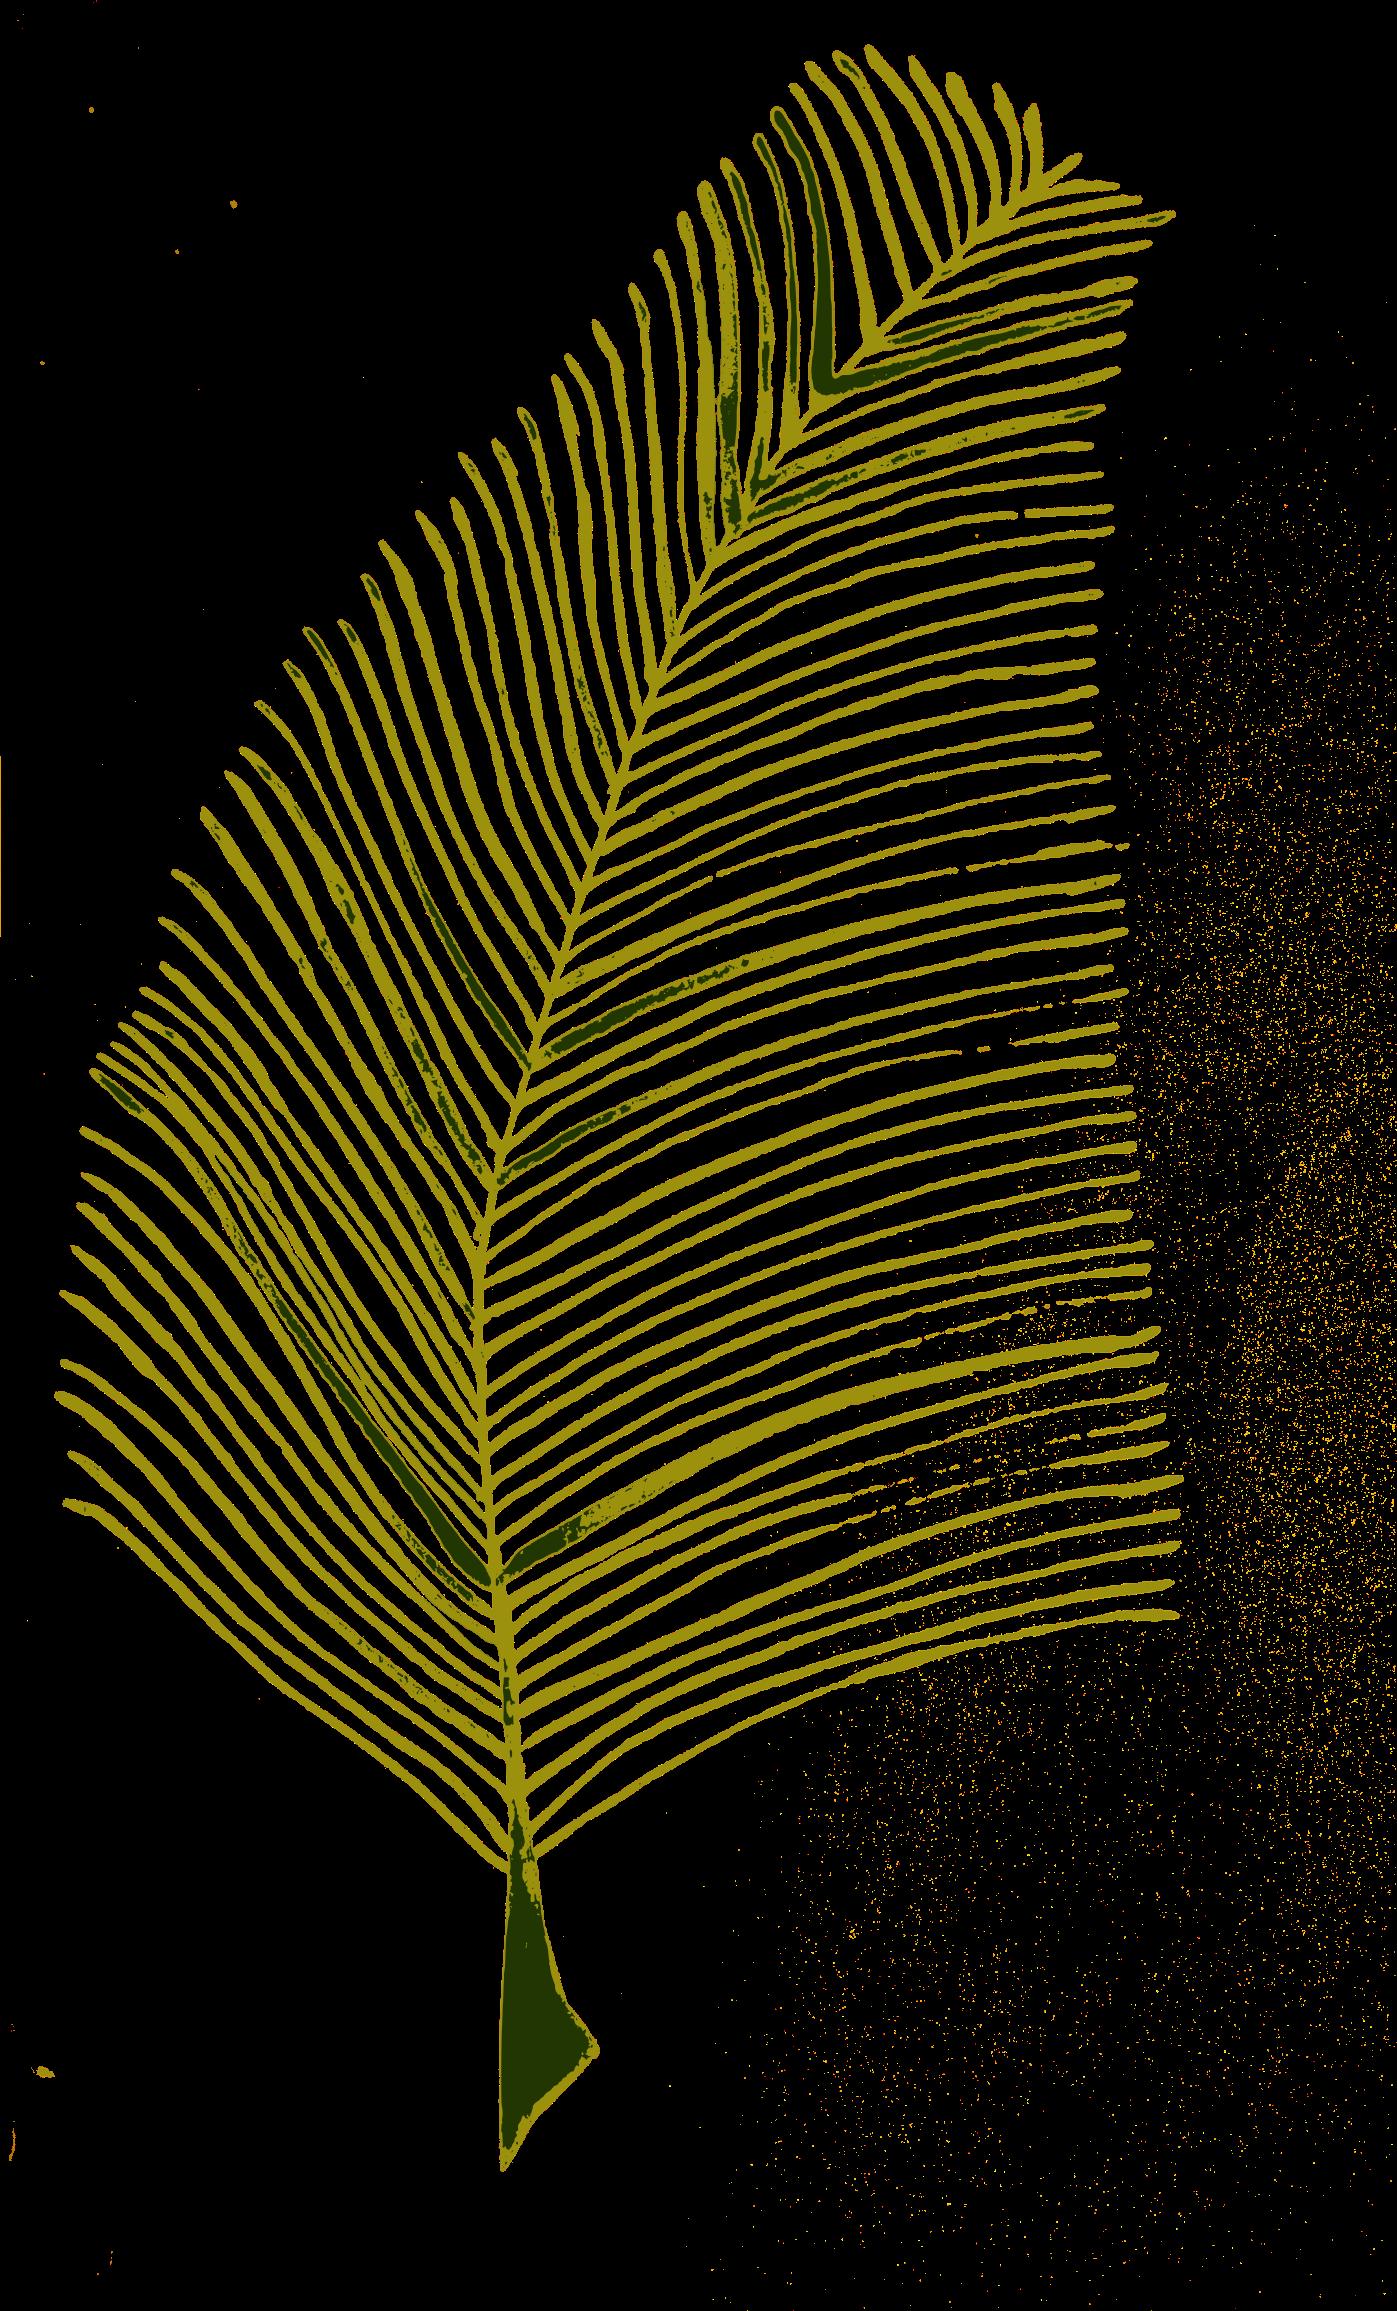 Leaf clipart twig. Calligraphic illustration plant big